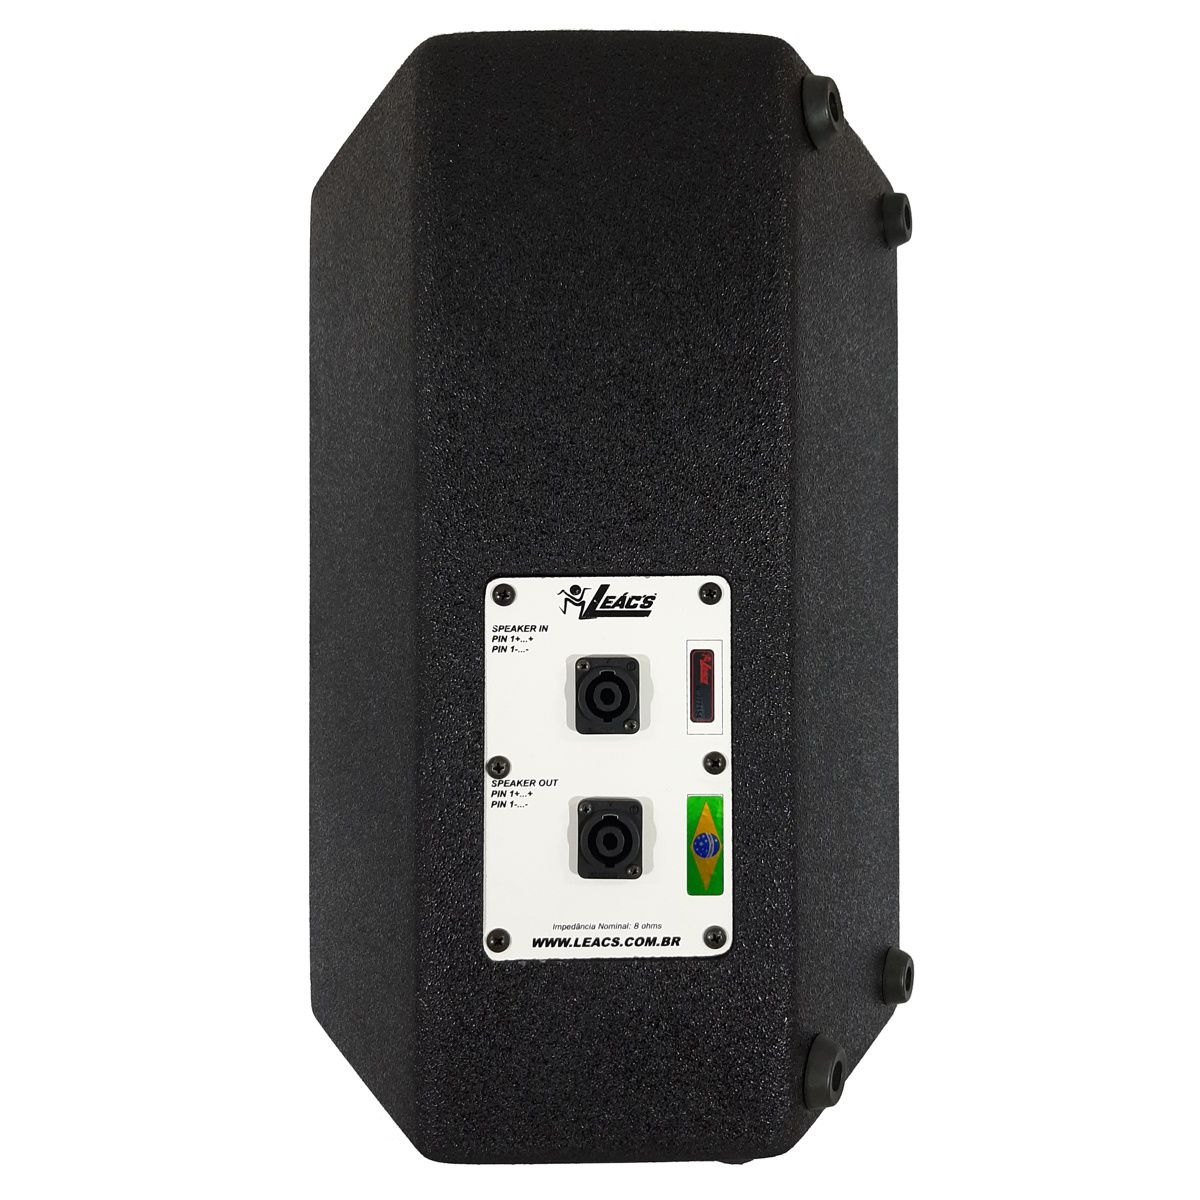 Kit Caixa de Som Ativa Passiva Leacs Fit550a Fit550 400w Rms Falante 15